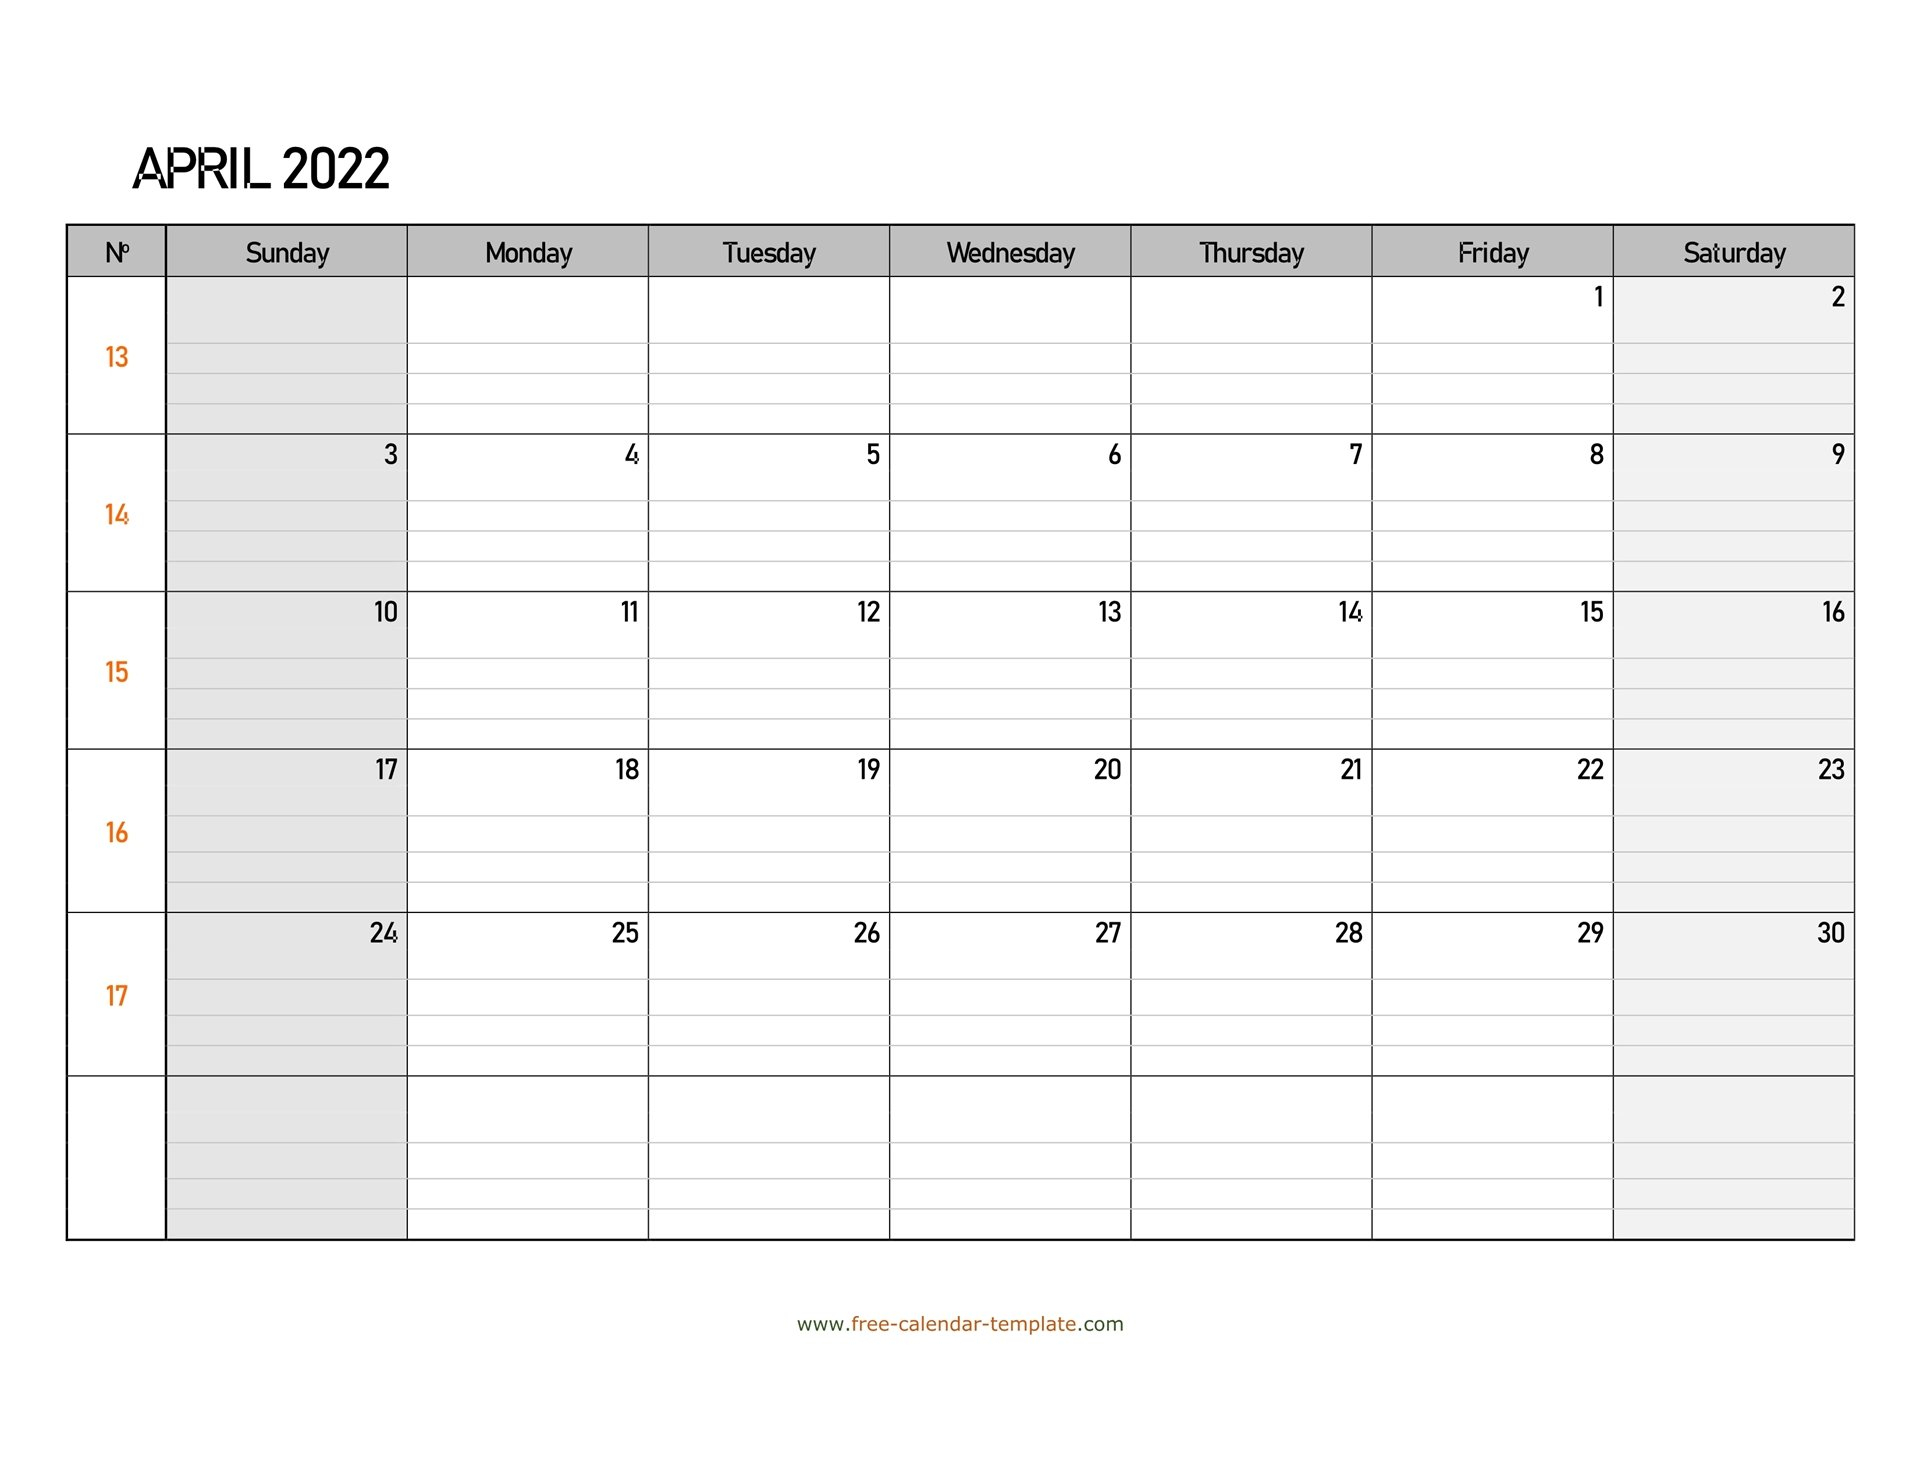 April 2022 Calendar Free Printable With Grid Lines for April May Calendar 2022 Printable